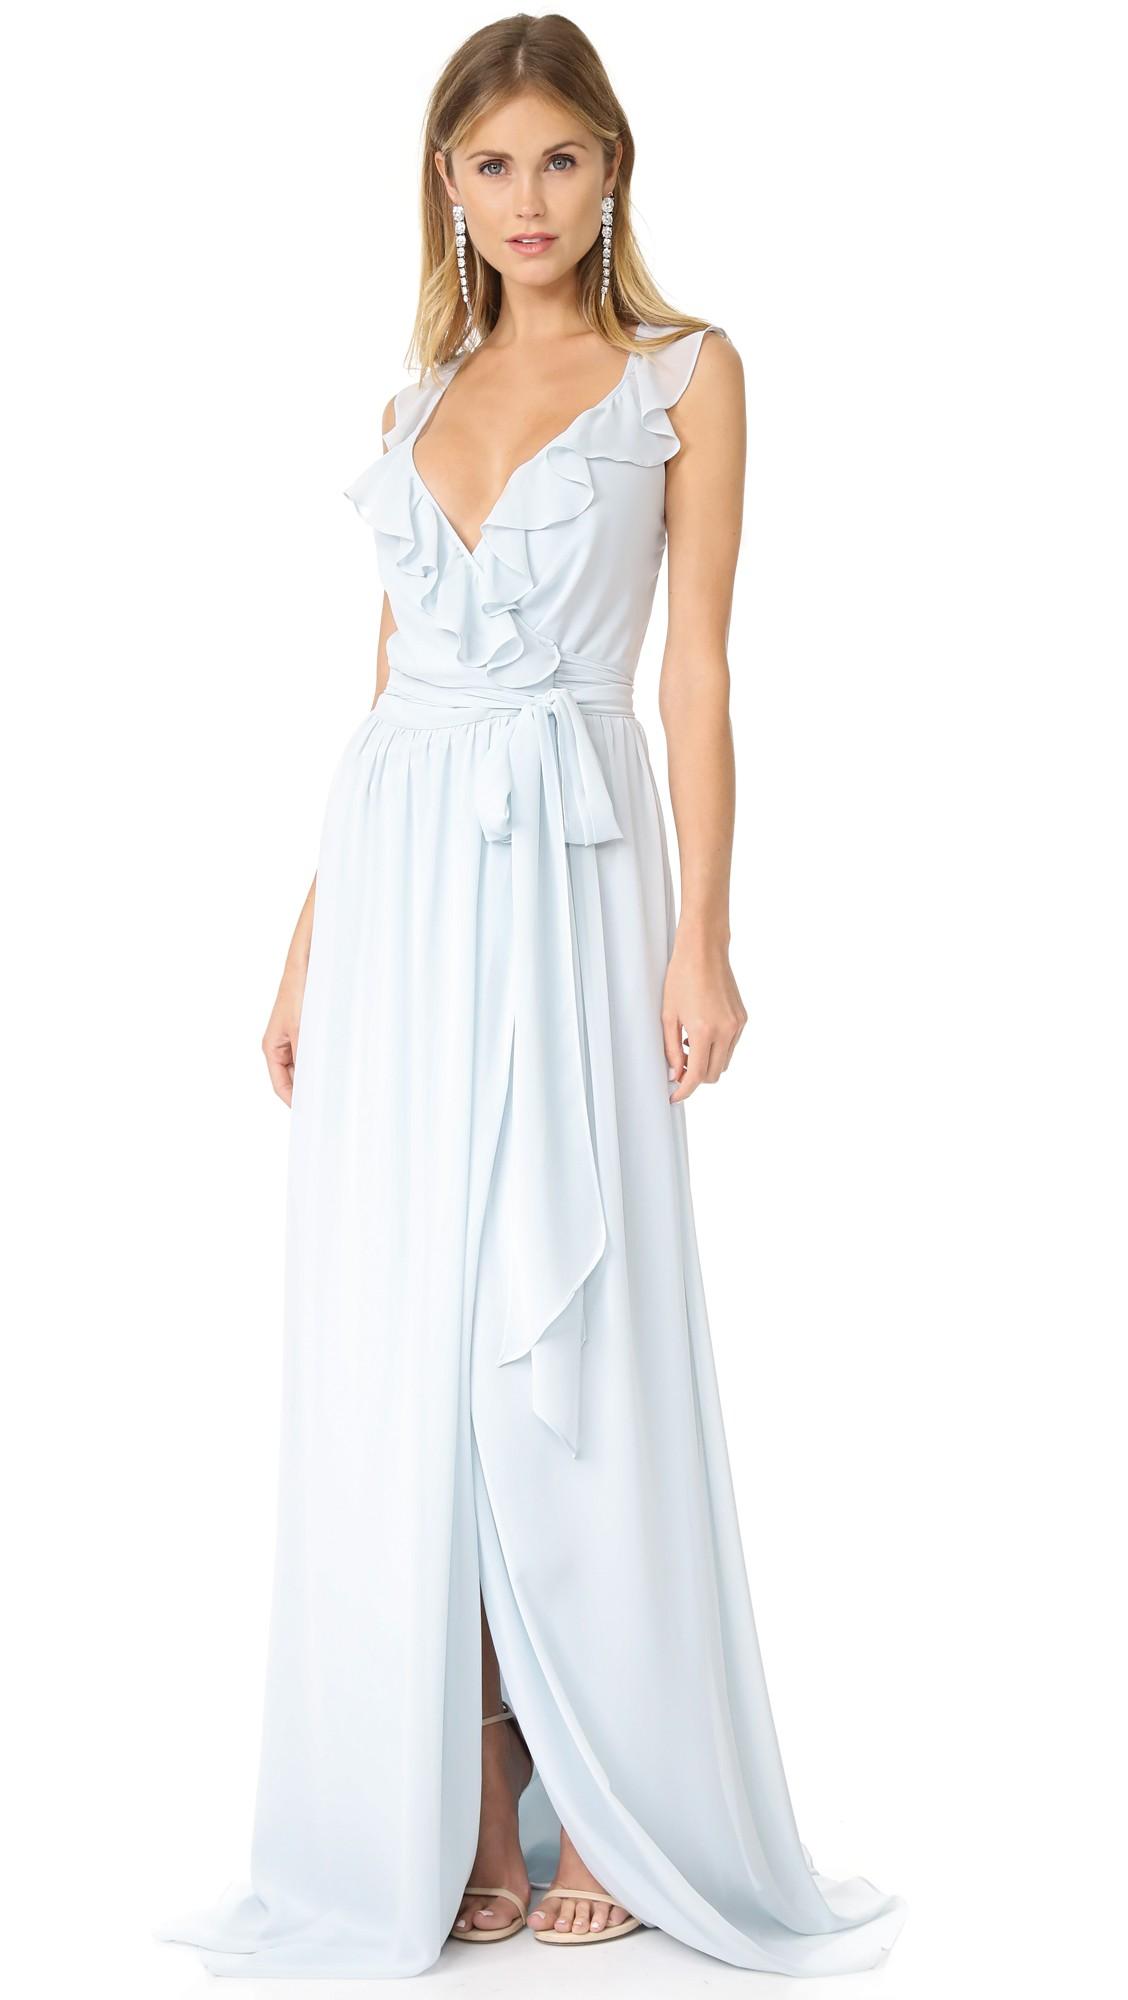 Light blue bridesmaid dresses shopbop ombrellifo Image collections